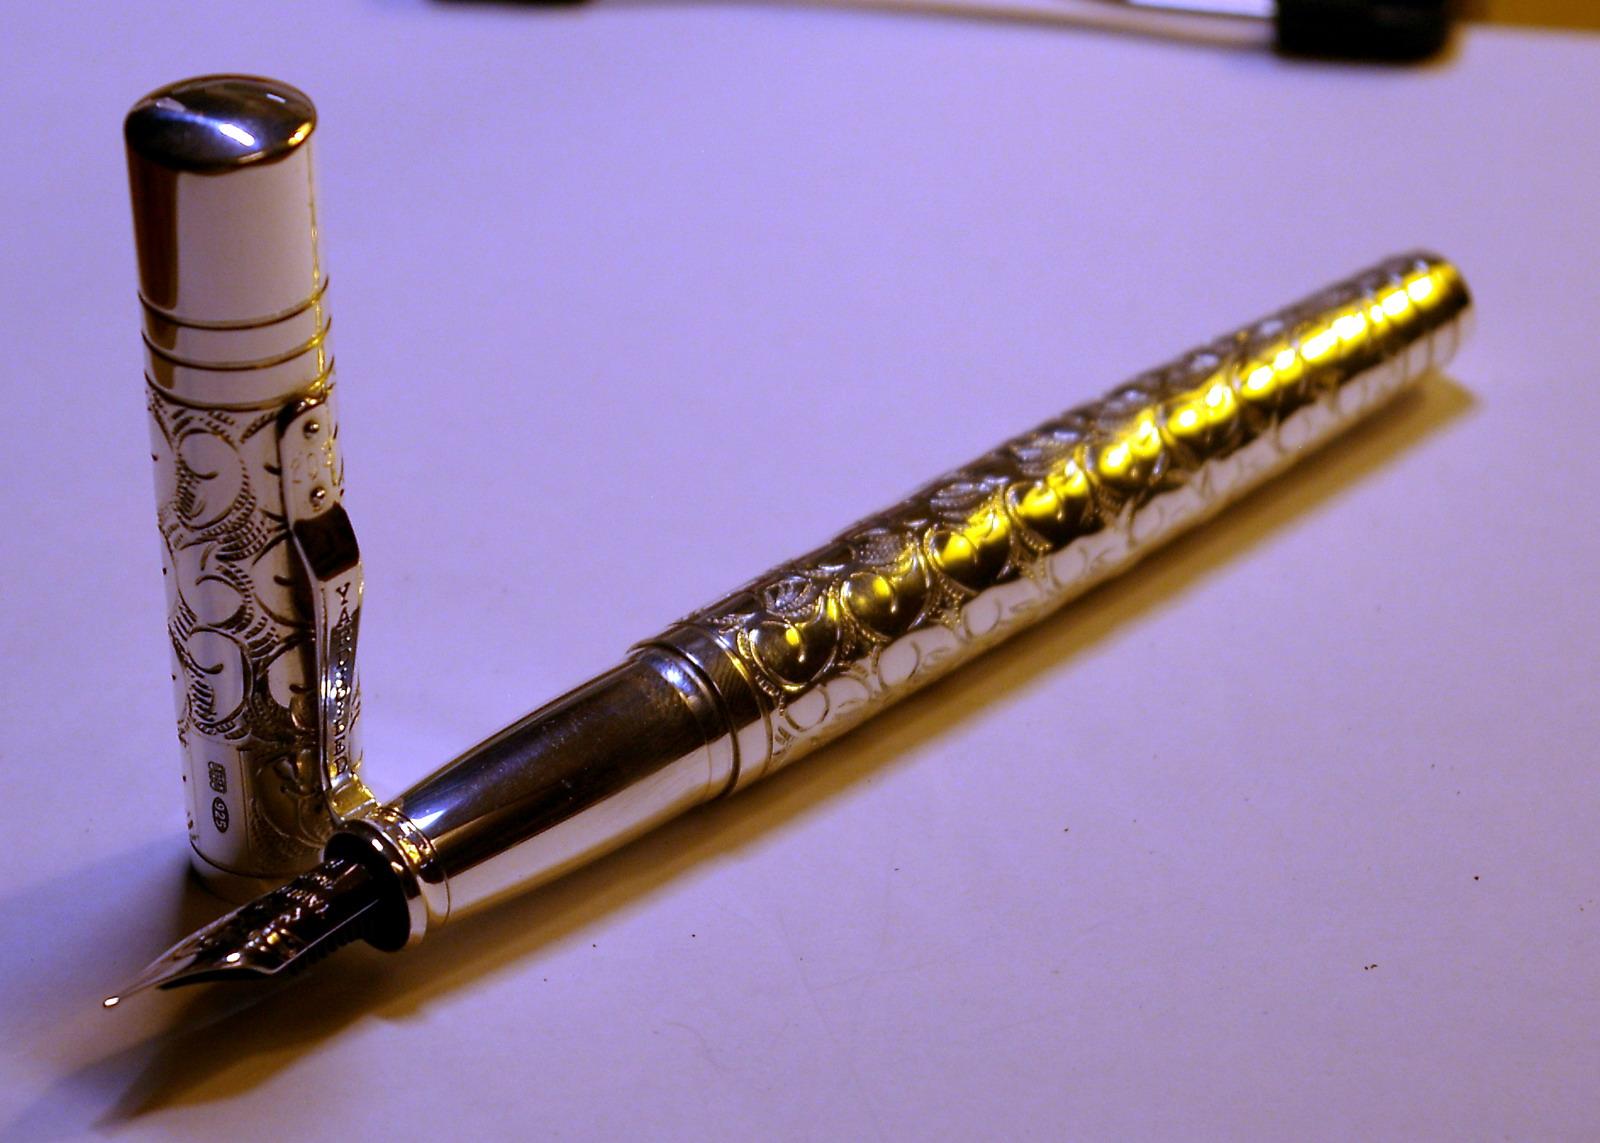 fpn_1496008018__silver_pens_8.jpg